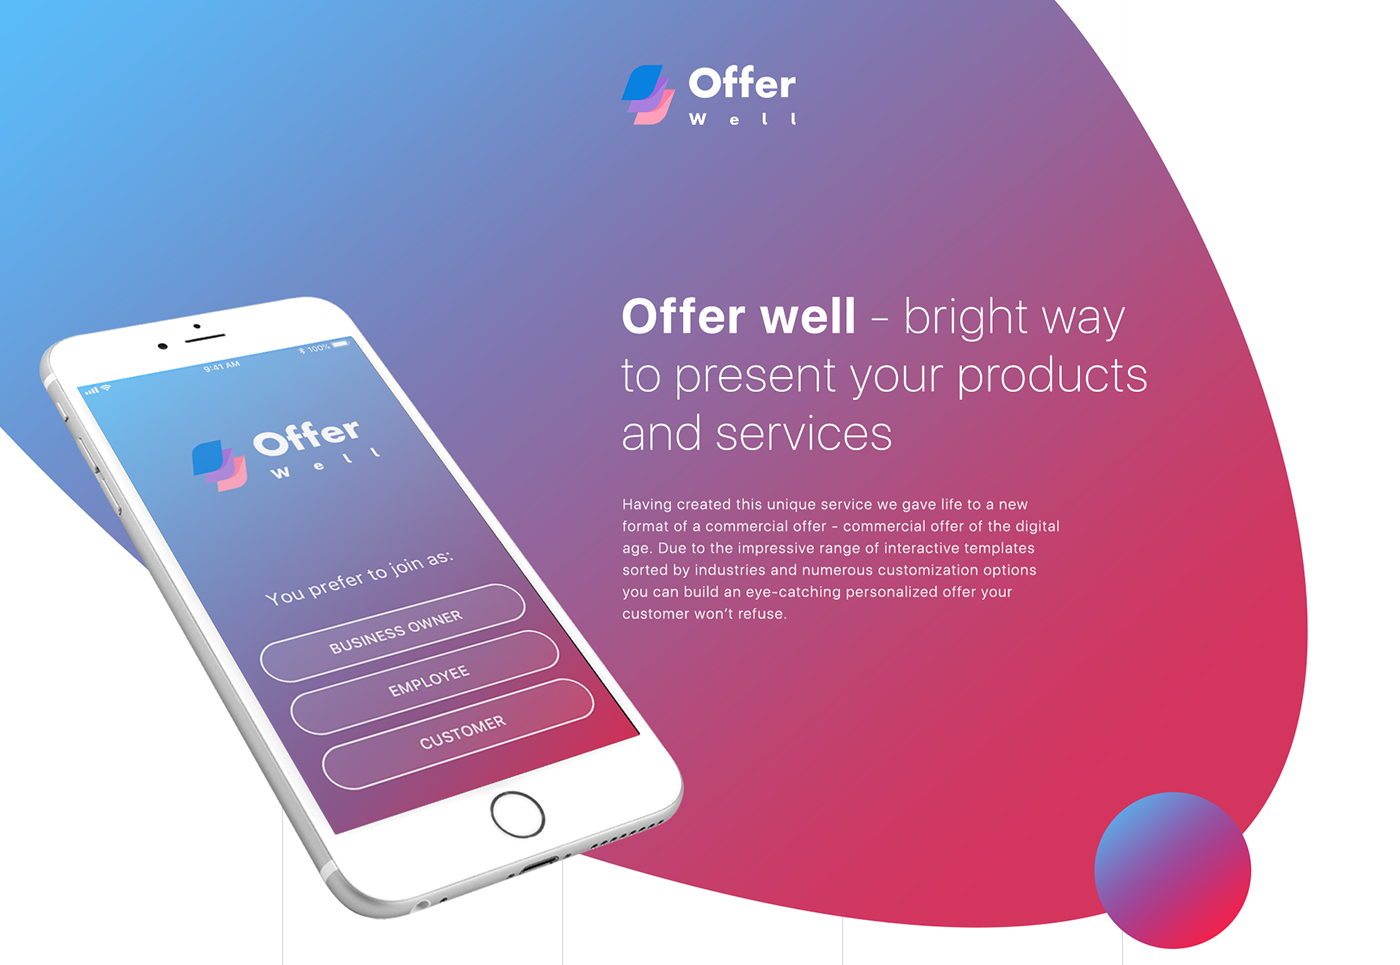 commercial offer maker commerical offer tool Mobile app gradient ux/ui dashboard business offer presentation Editor